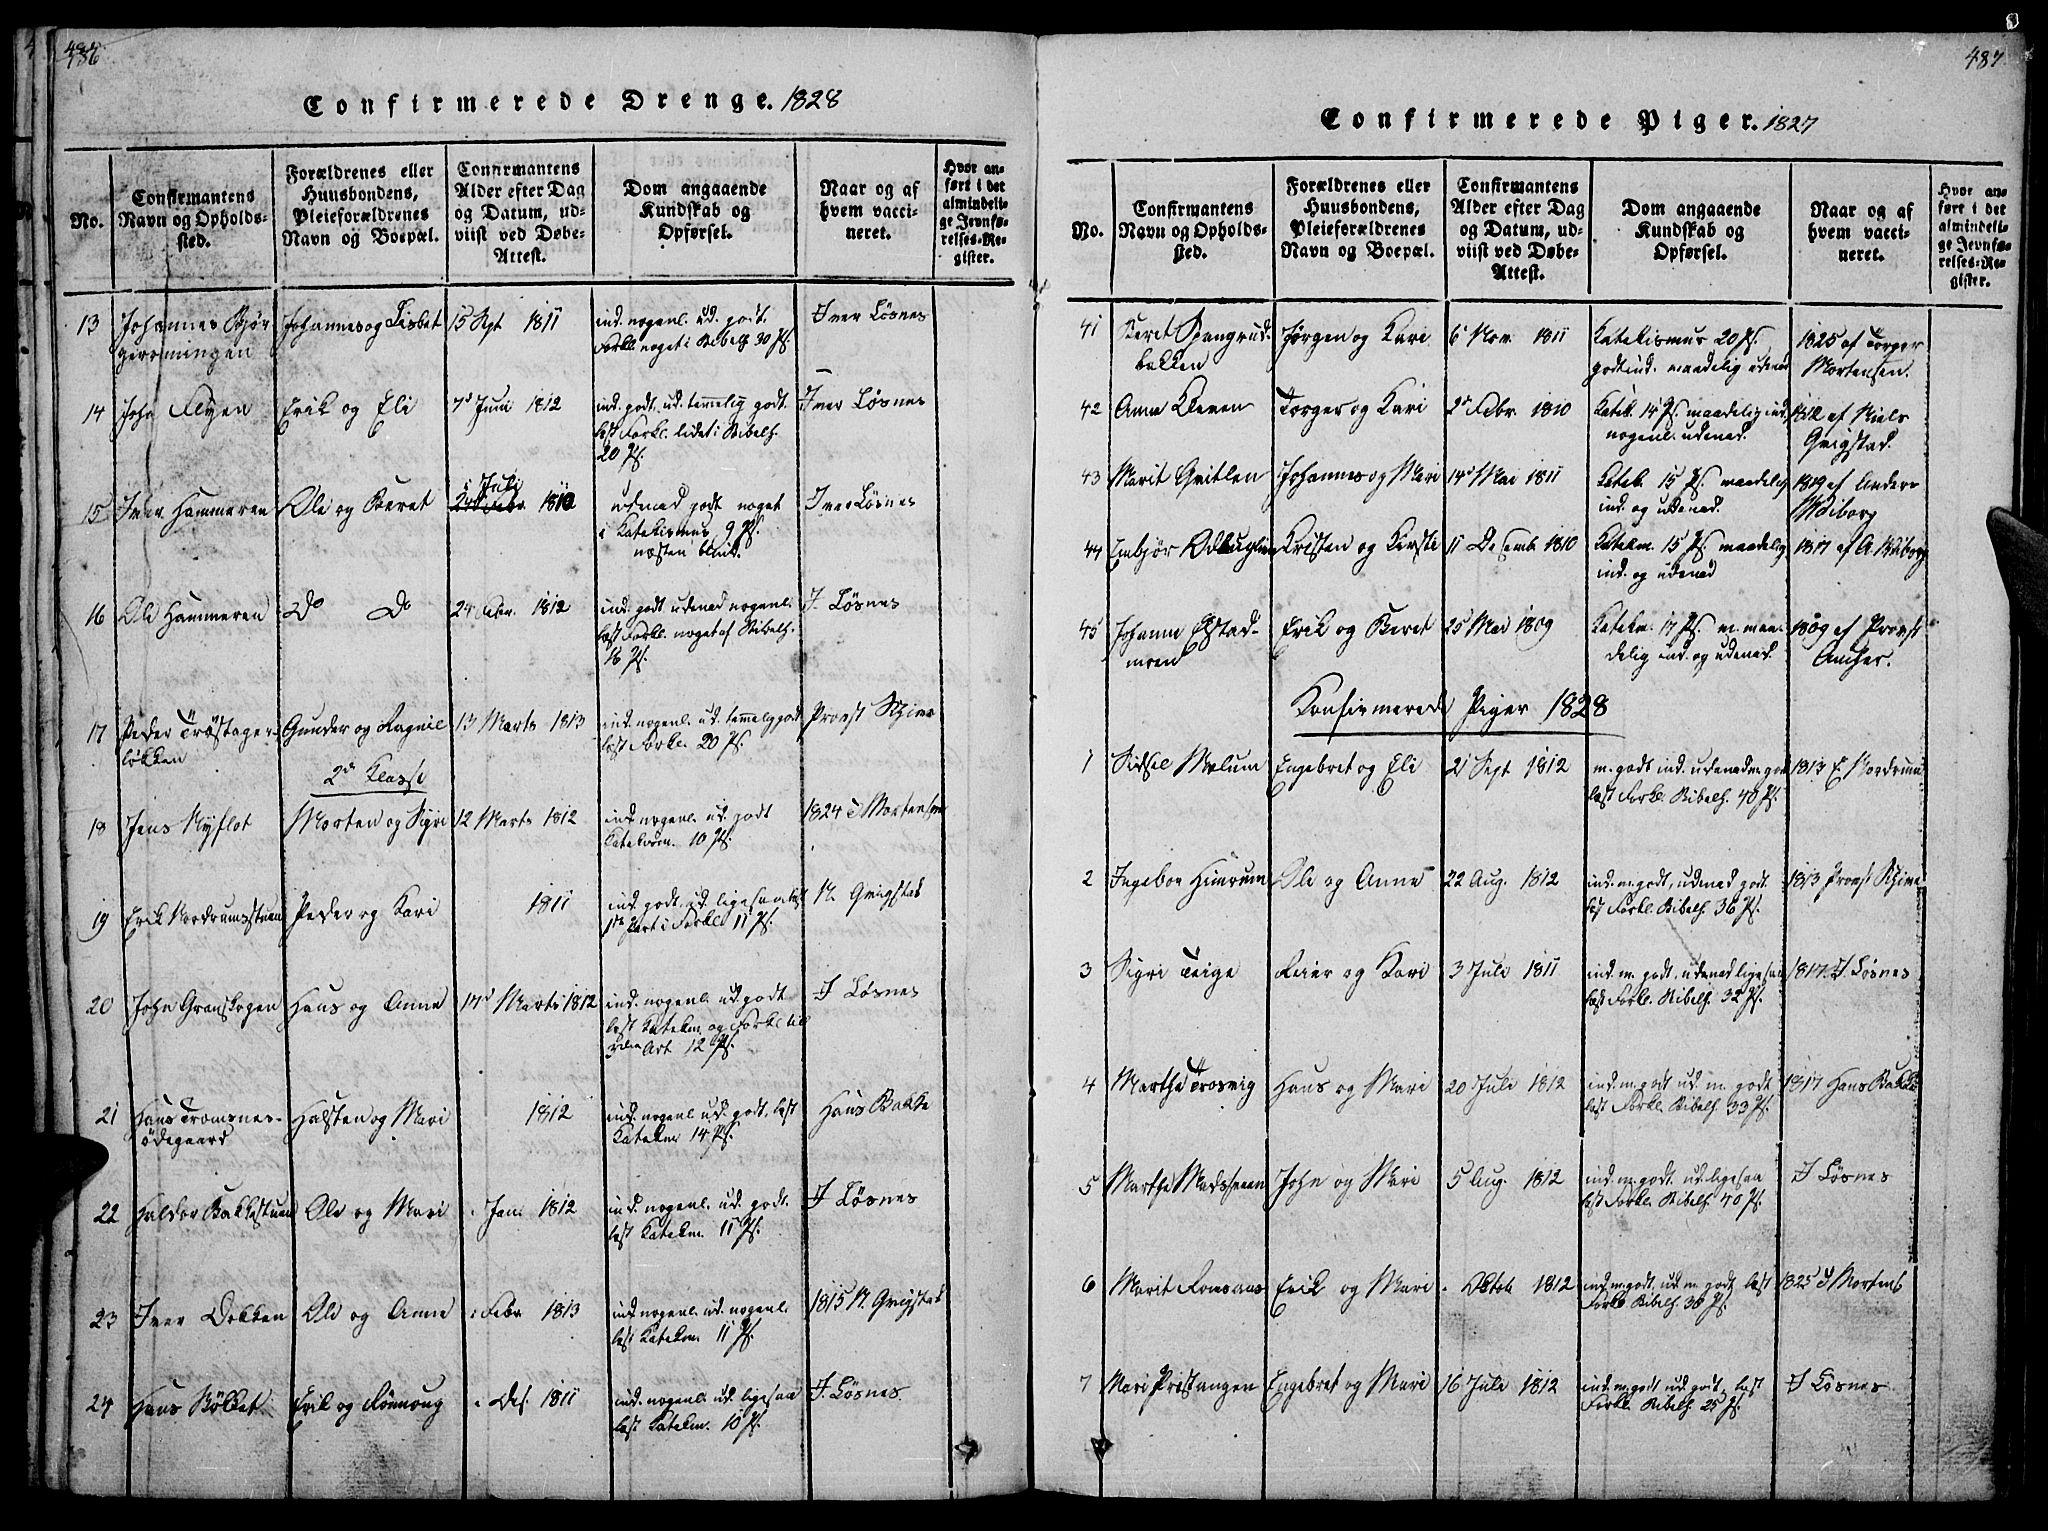 SAH, Ringebu prestekontor, Ministerialbok nr. 4, 1821-1839, s. 486-487